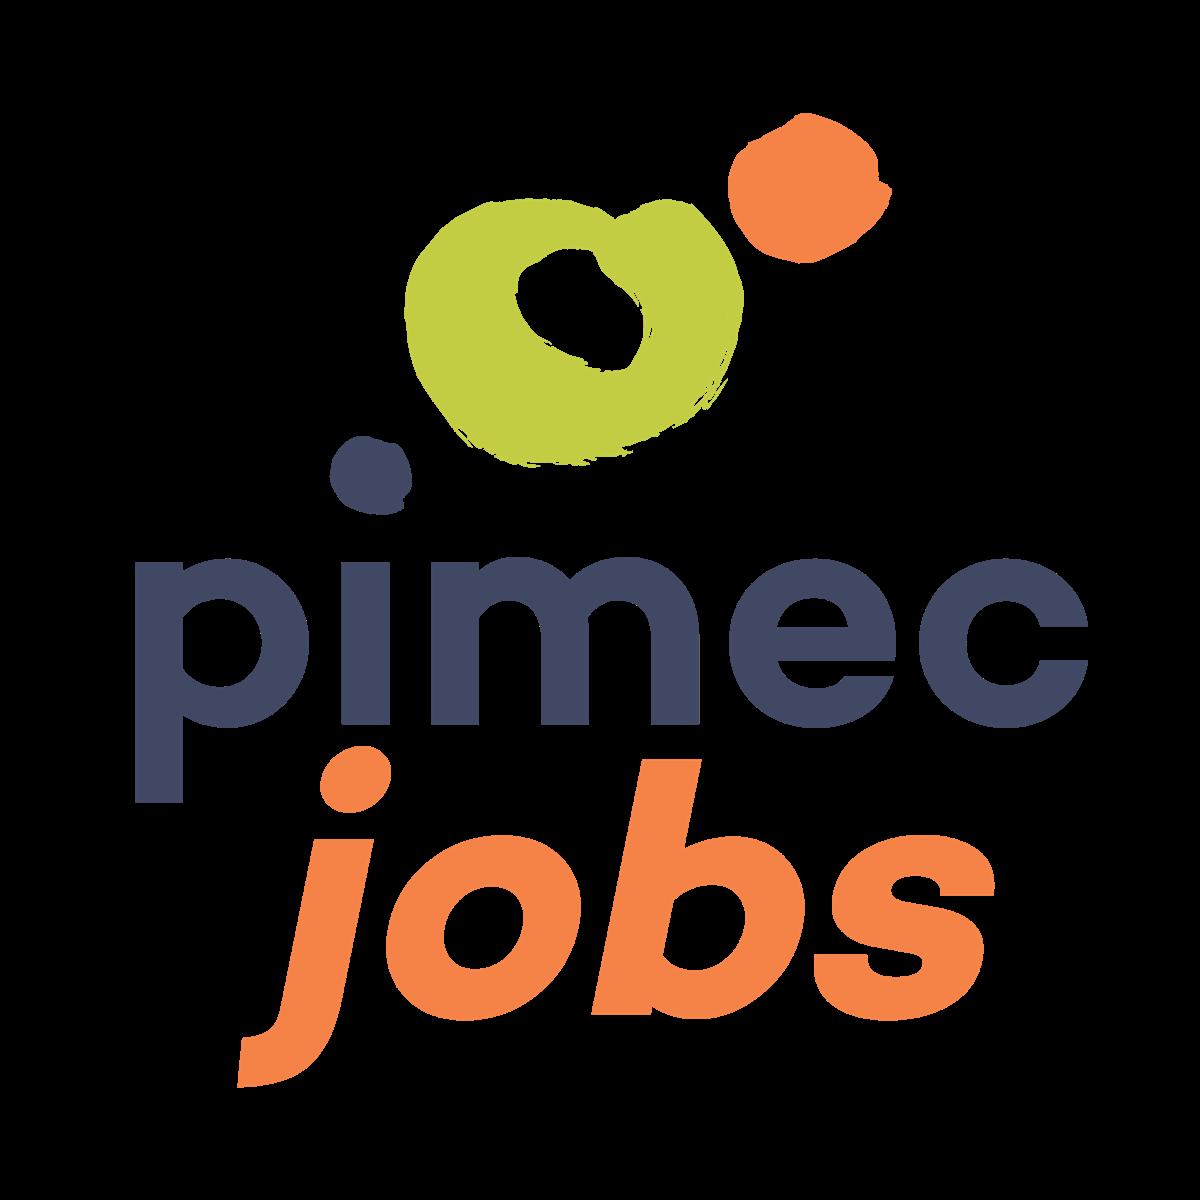 pimecjobs.png